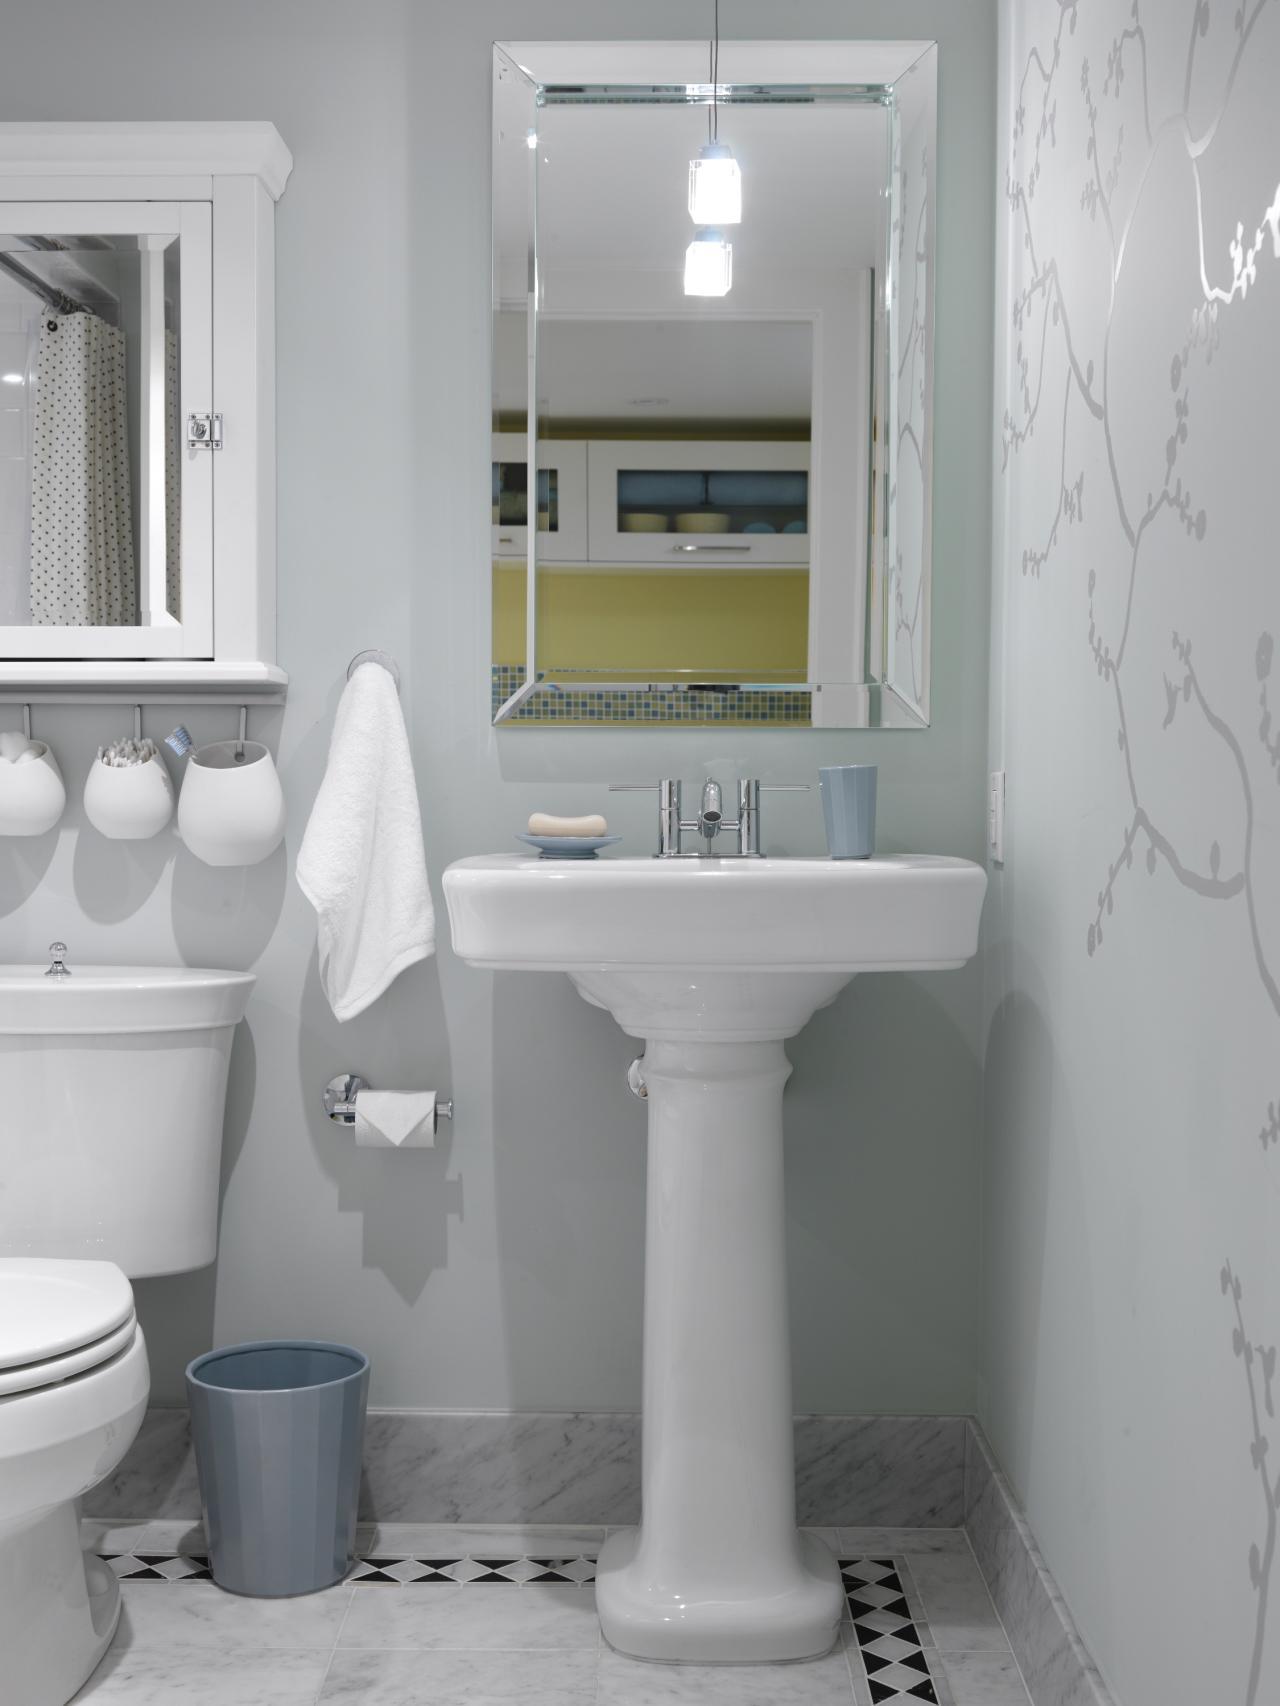 Awesome Tags: bathroom decor ideas for small bathrooms